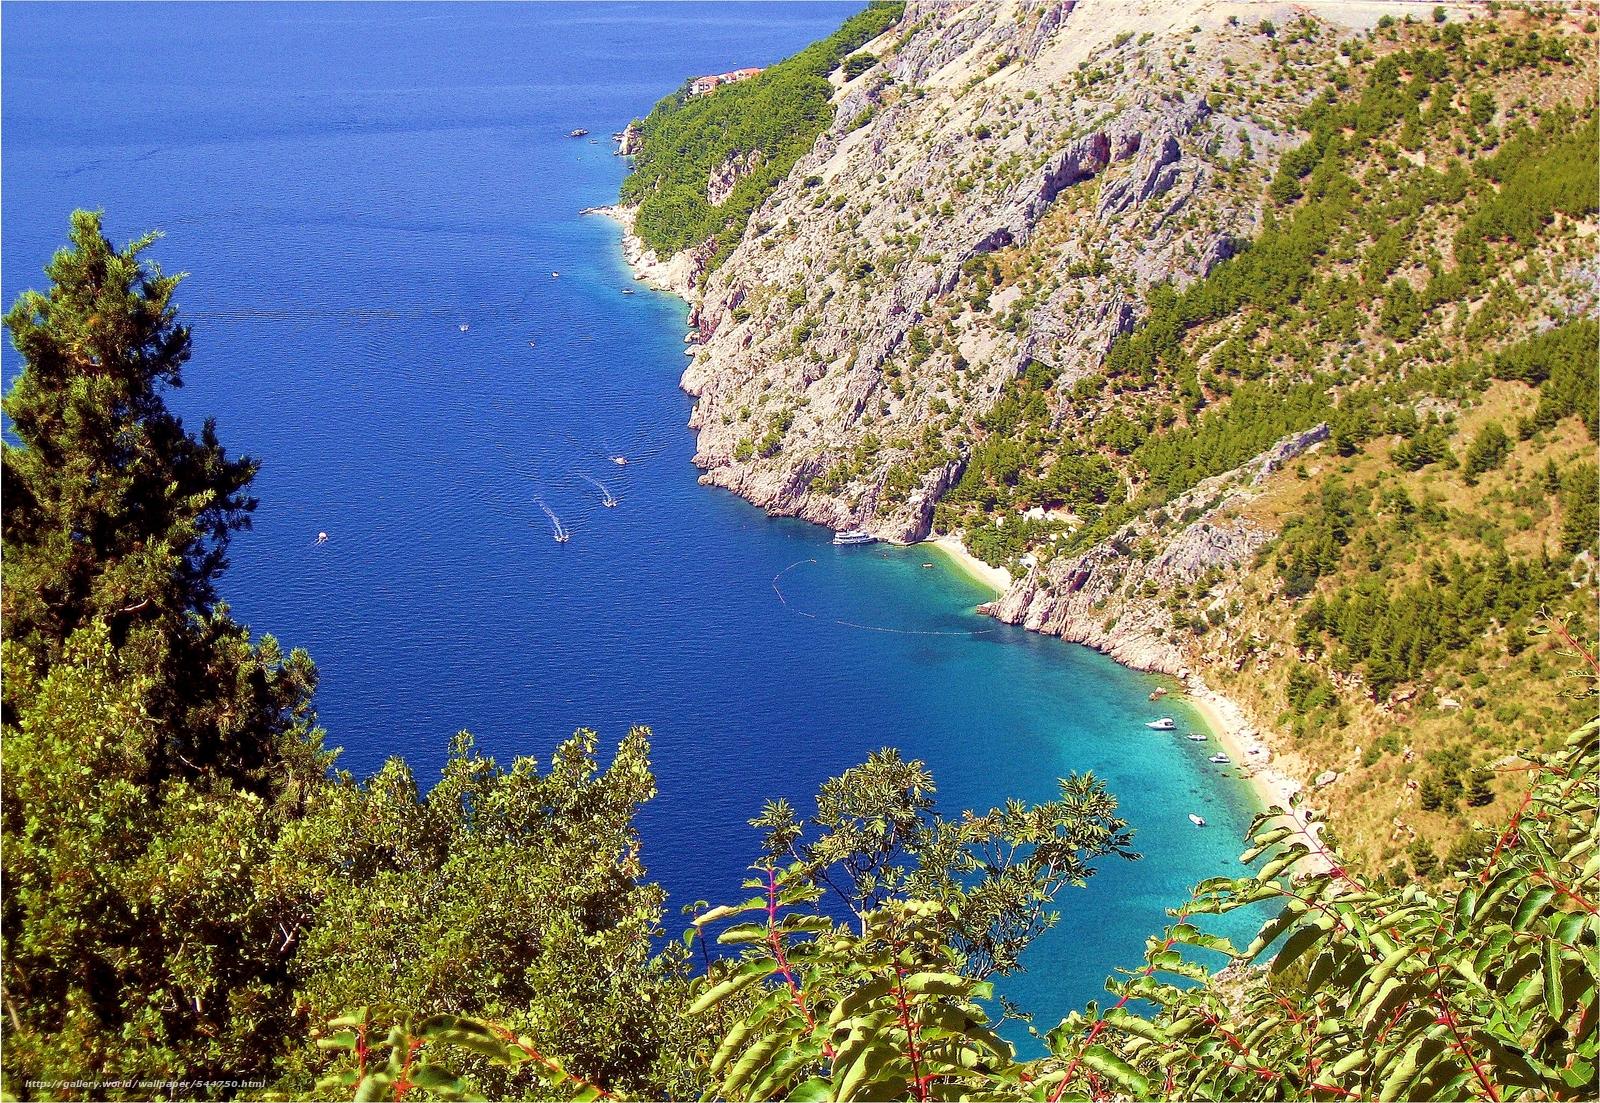 croatia landscape wallpaper - photo #18